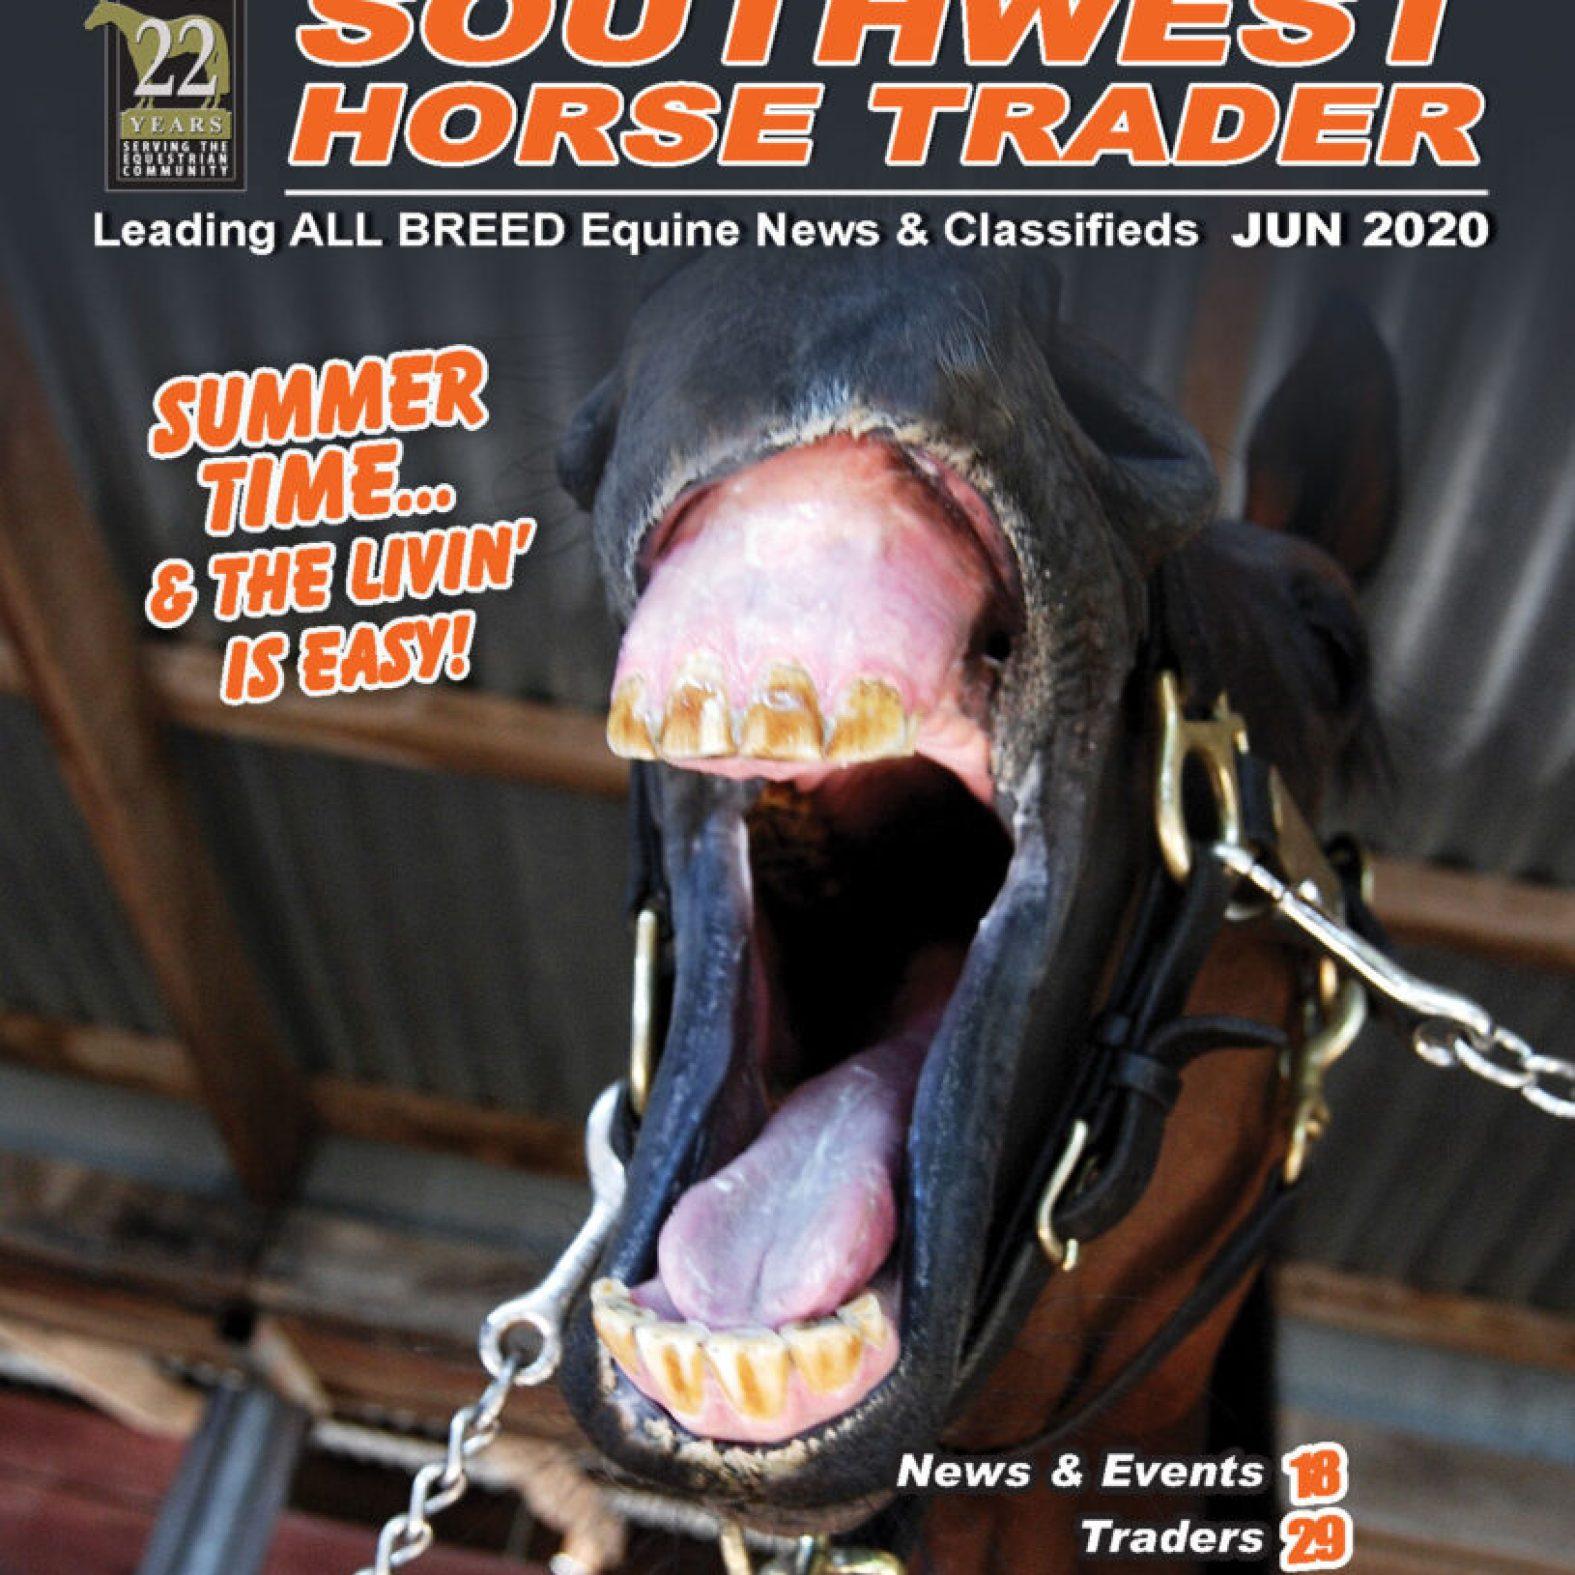 SouthWest Horse Trader June 2020 Issue